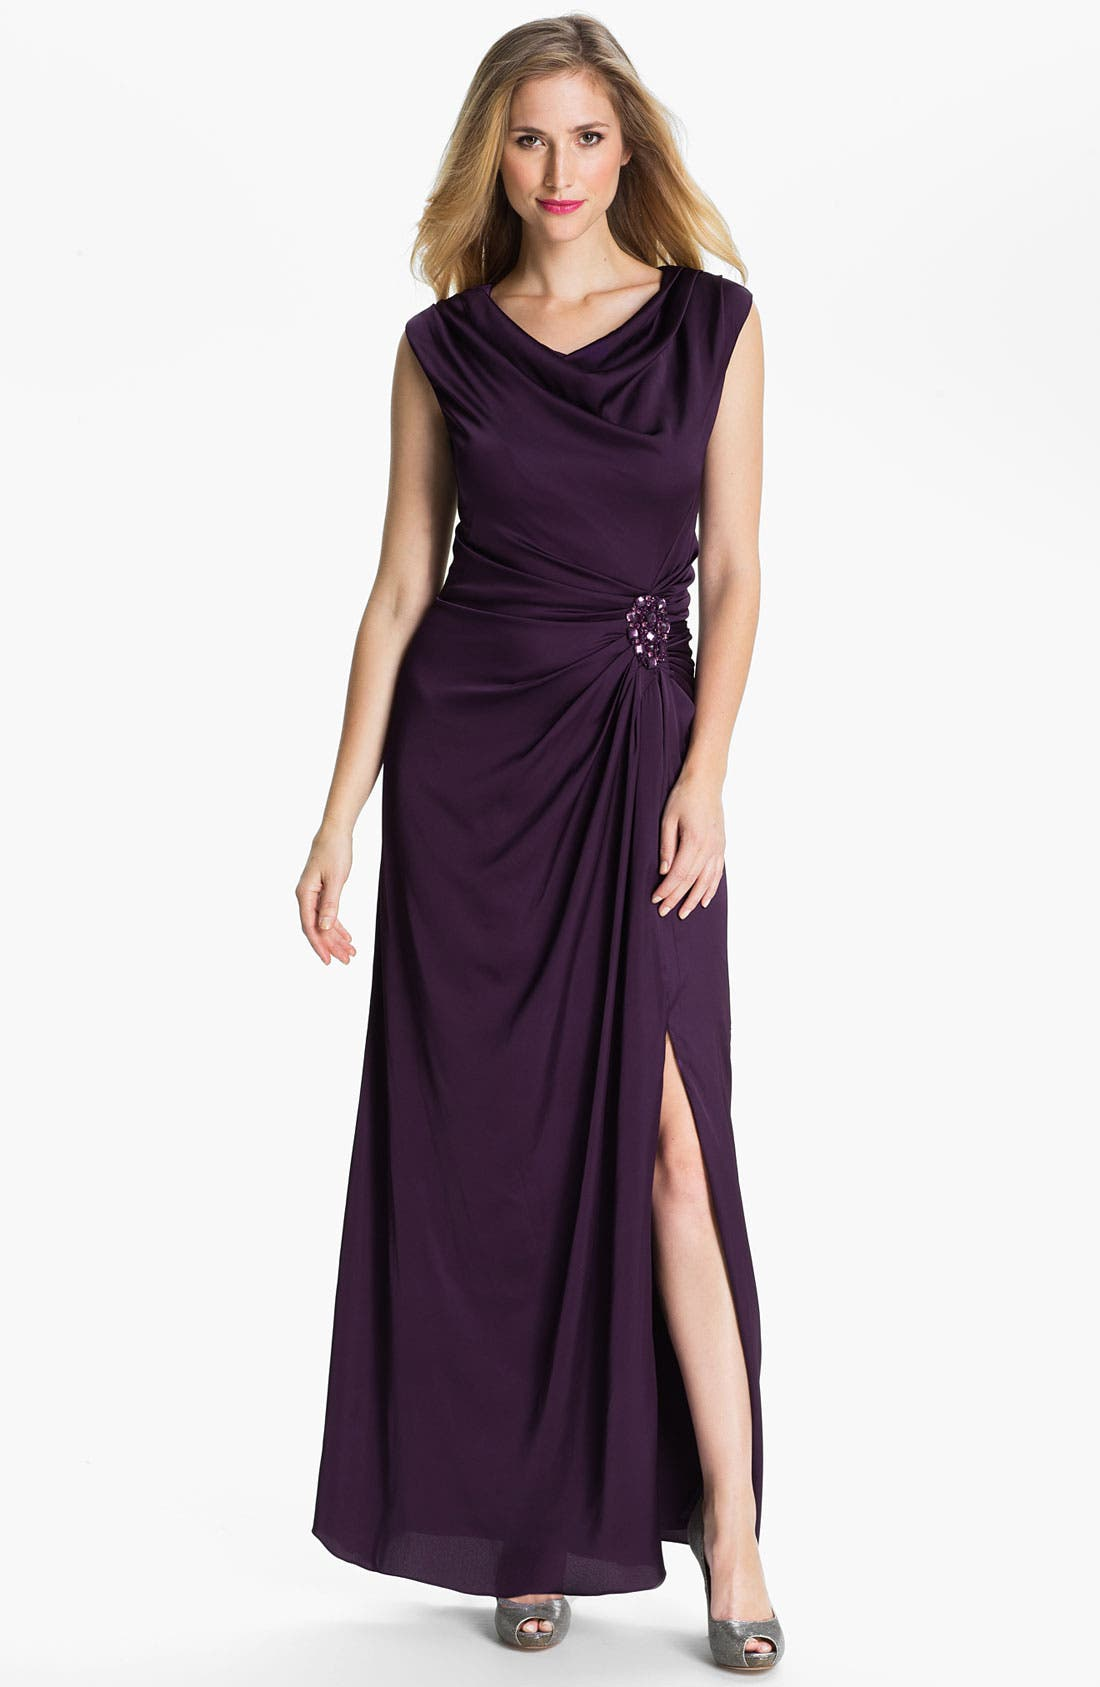 Alternate Image 1 Selected - Patra Cowl Neck Side Slit Satin Gown (Petite)